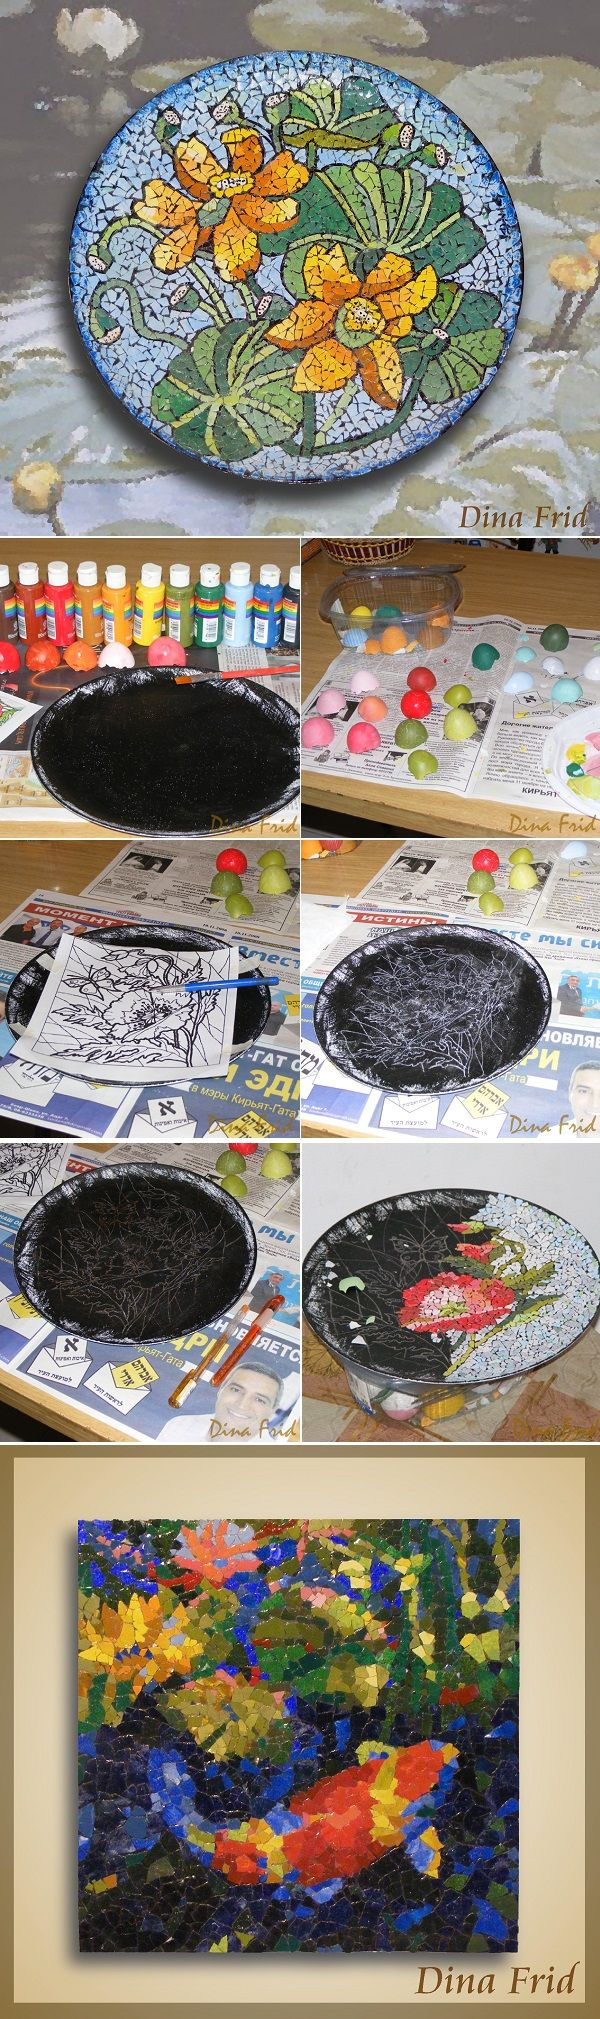 Eggshell-Mosaic- more ideas for egg shells www.ourdailyideas.com/diy-eggshell-mosaic-patterns/